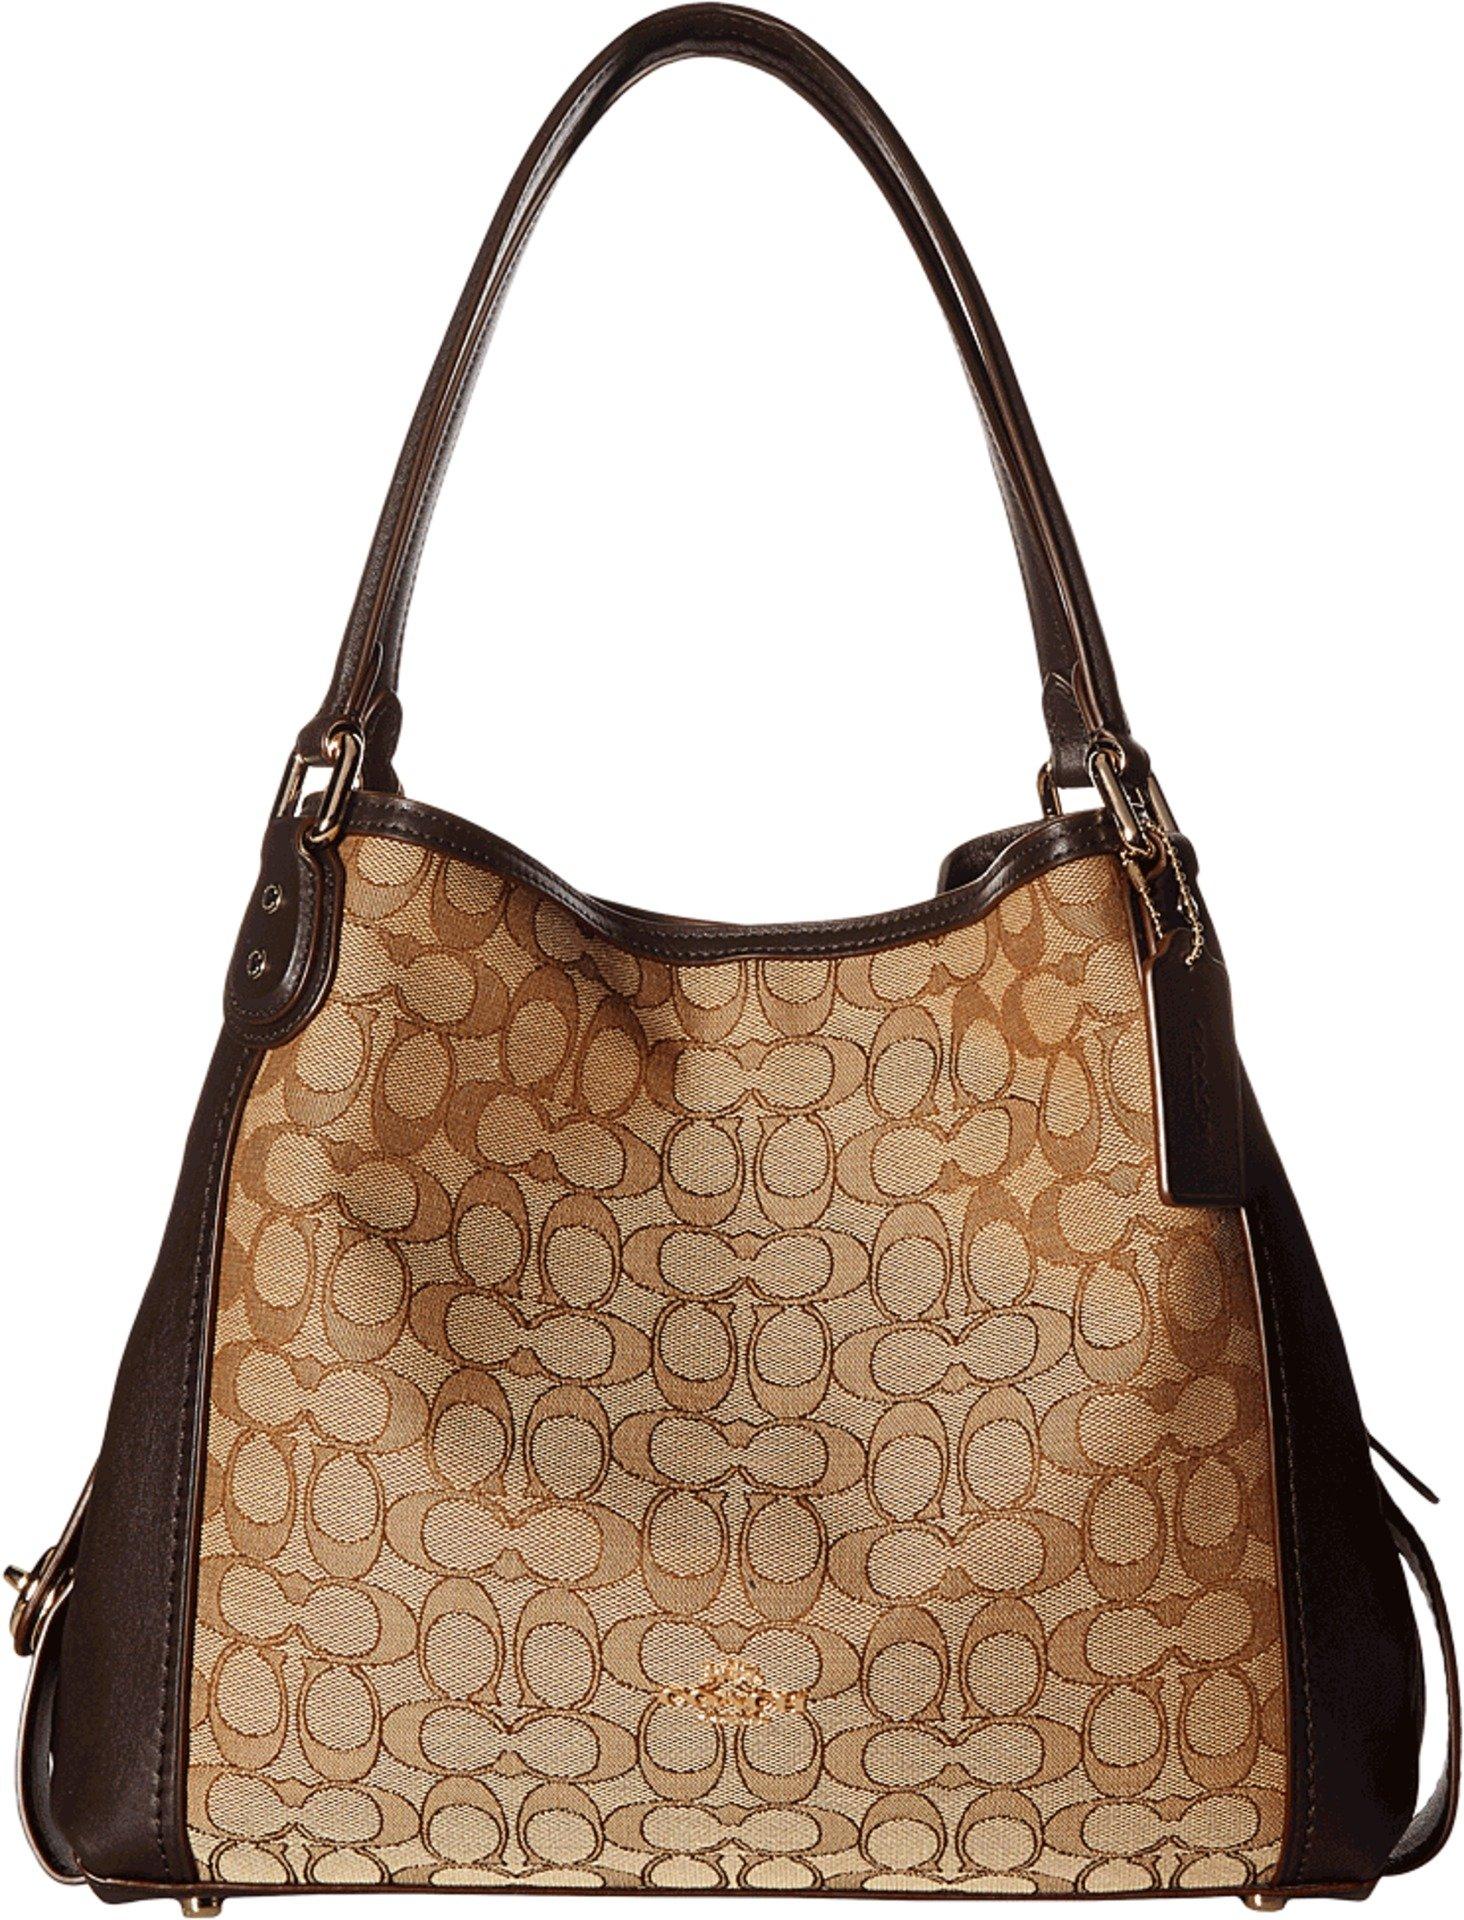 Coach Women's Edie 31 Signature Shoulder Bag, Light Gold, Khaki, Brown, OS